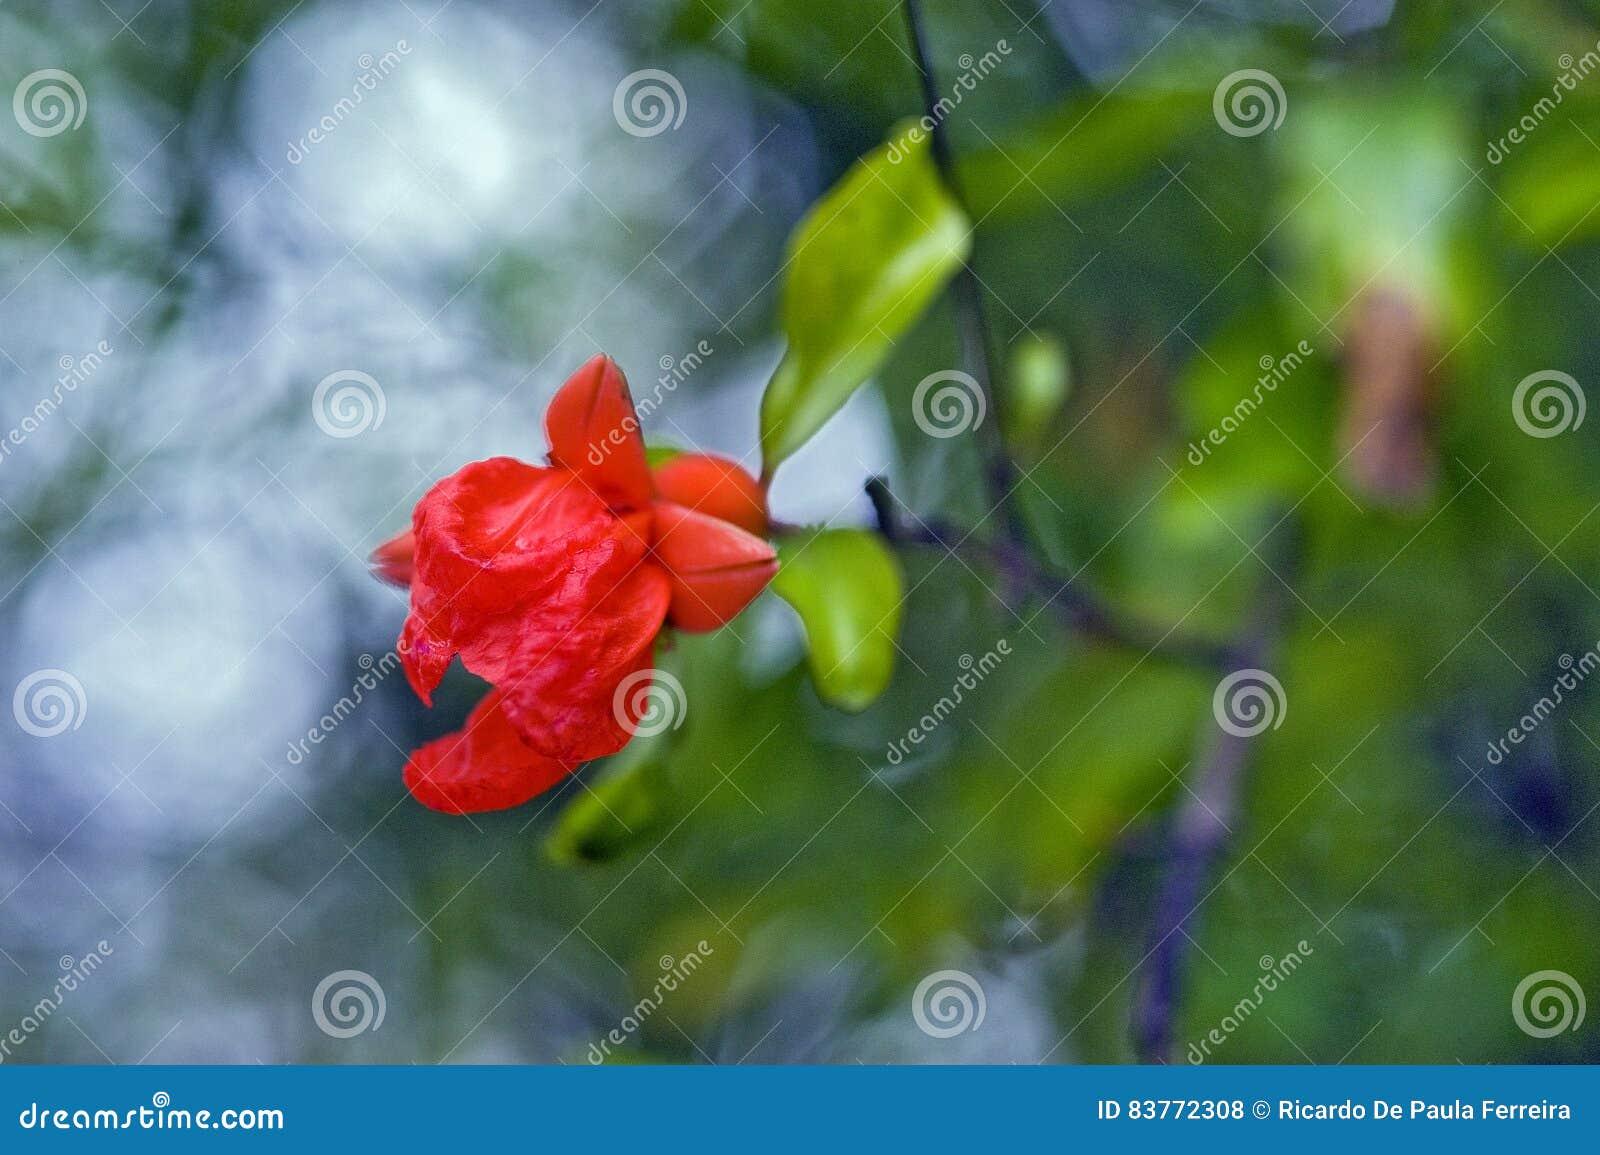 Pomegranate flower